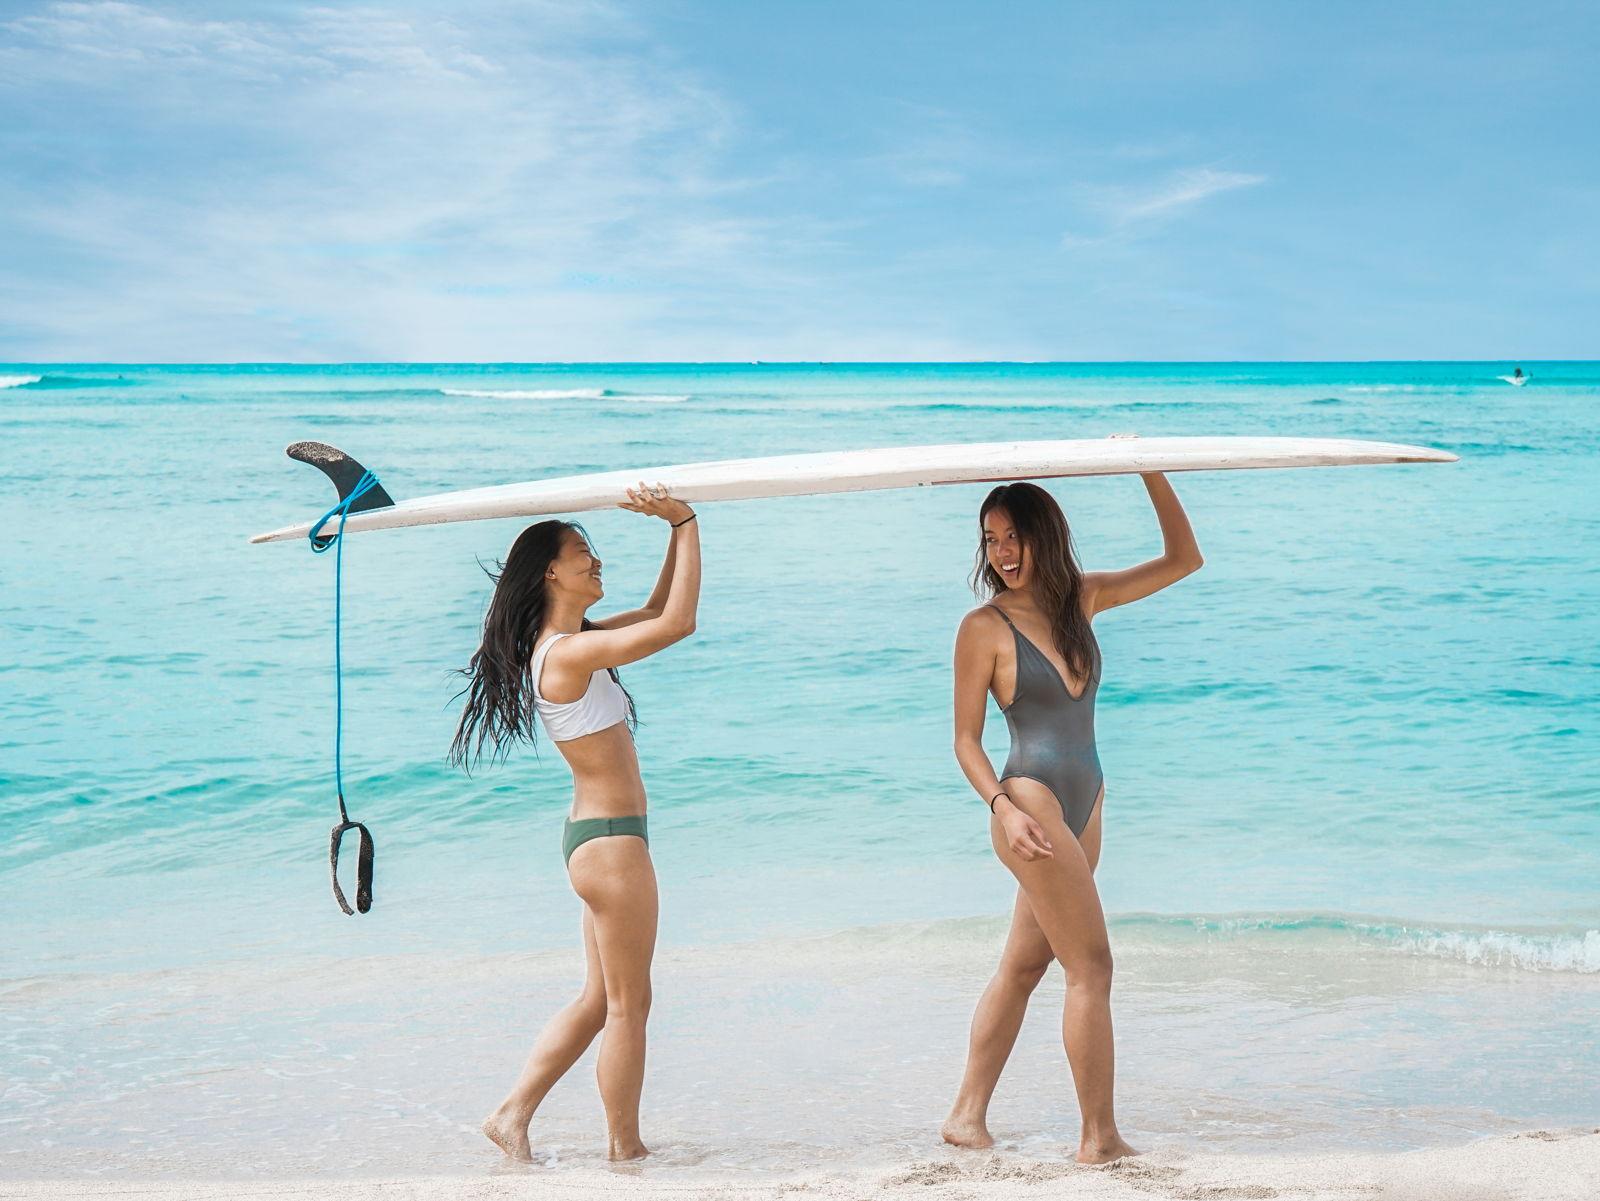 Top 10 Things To Do In Oahu, Hawaii